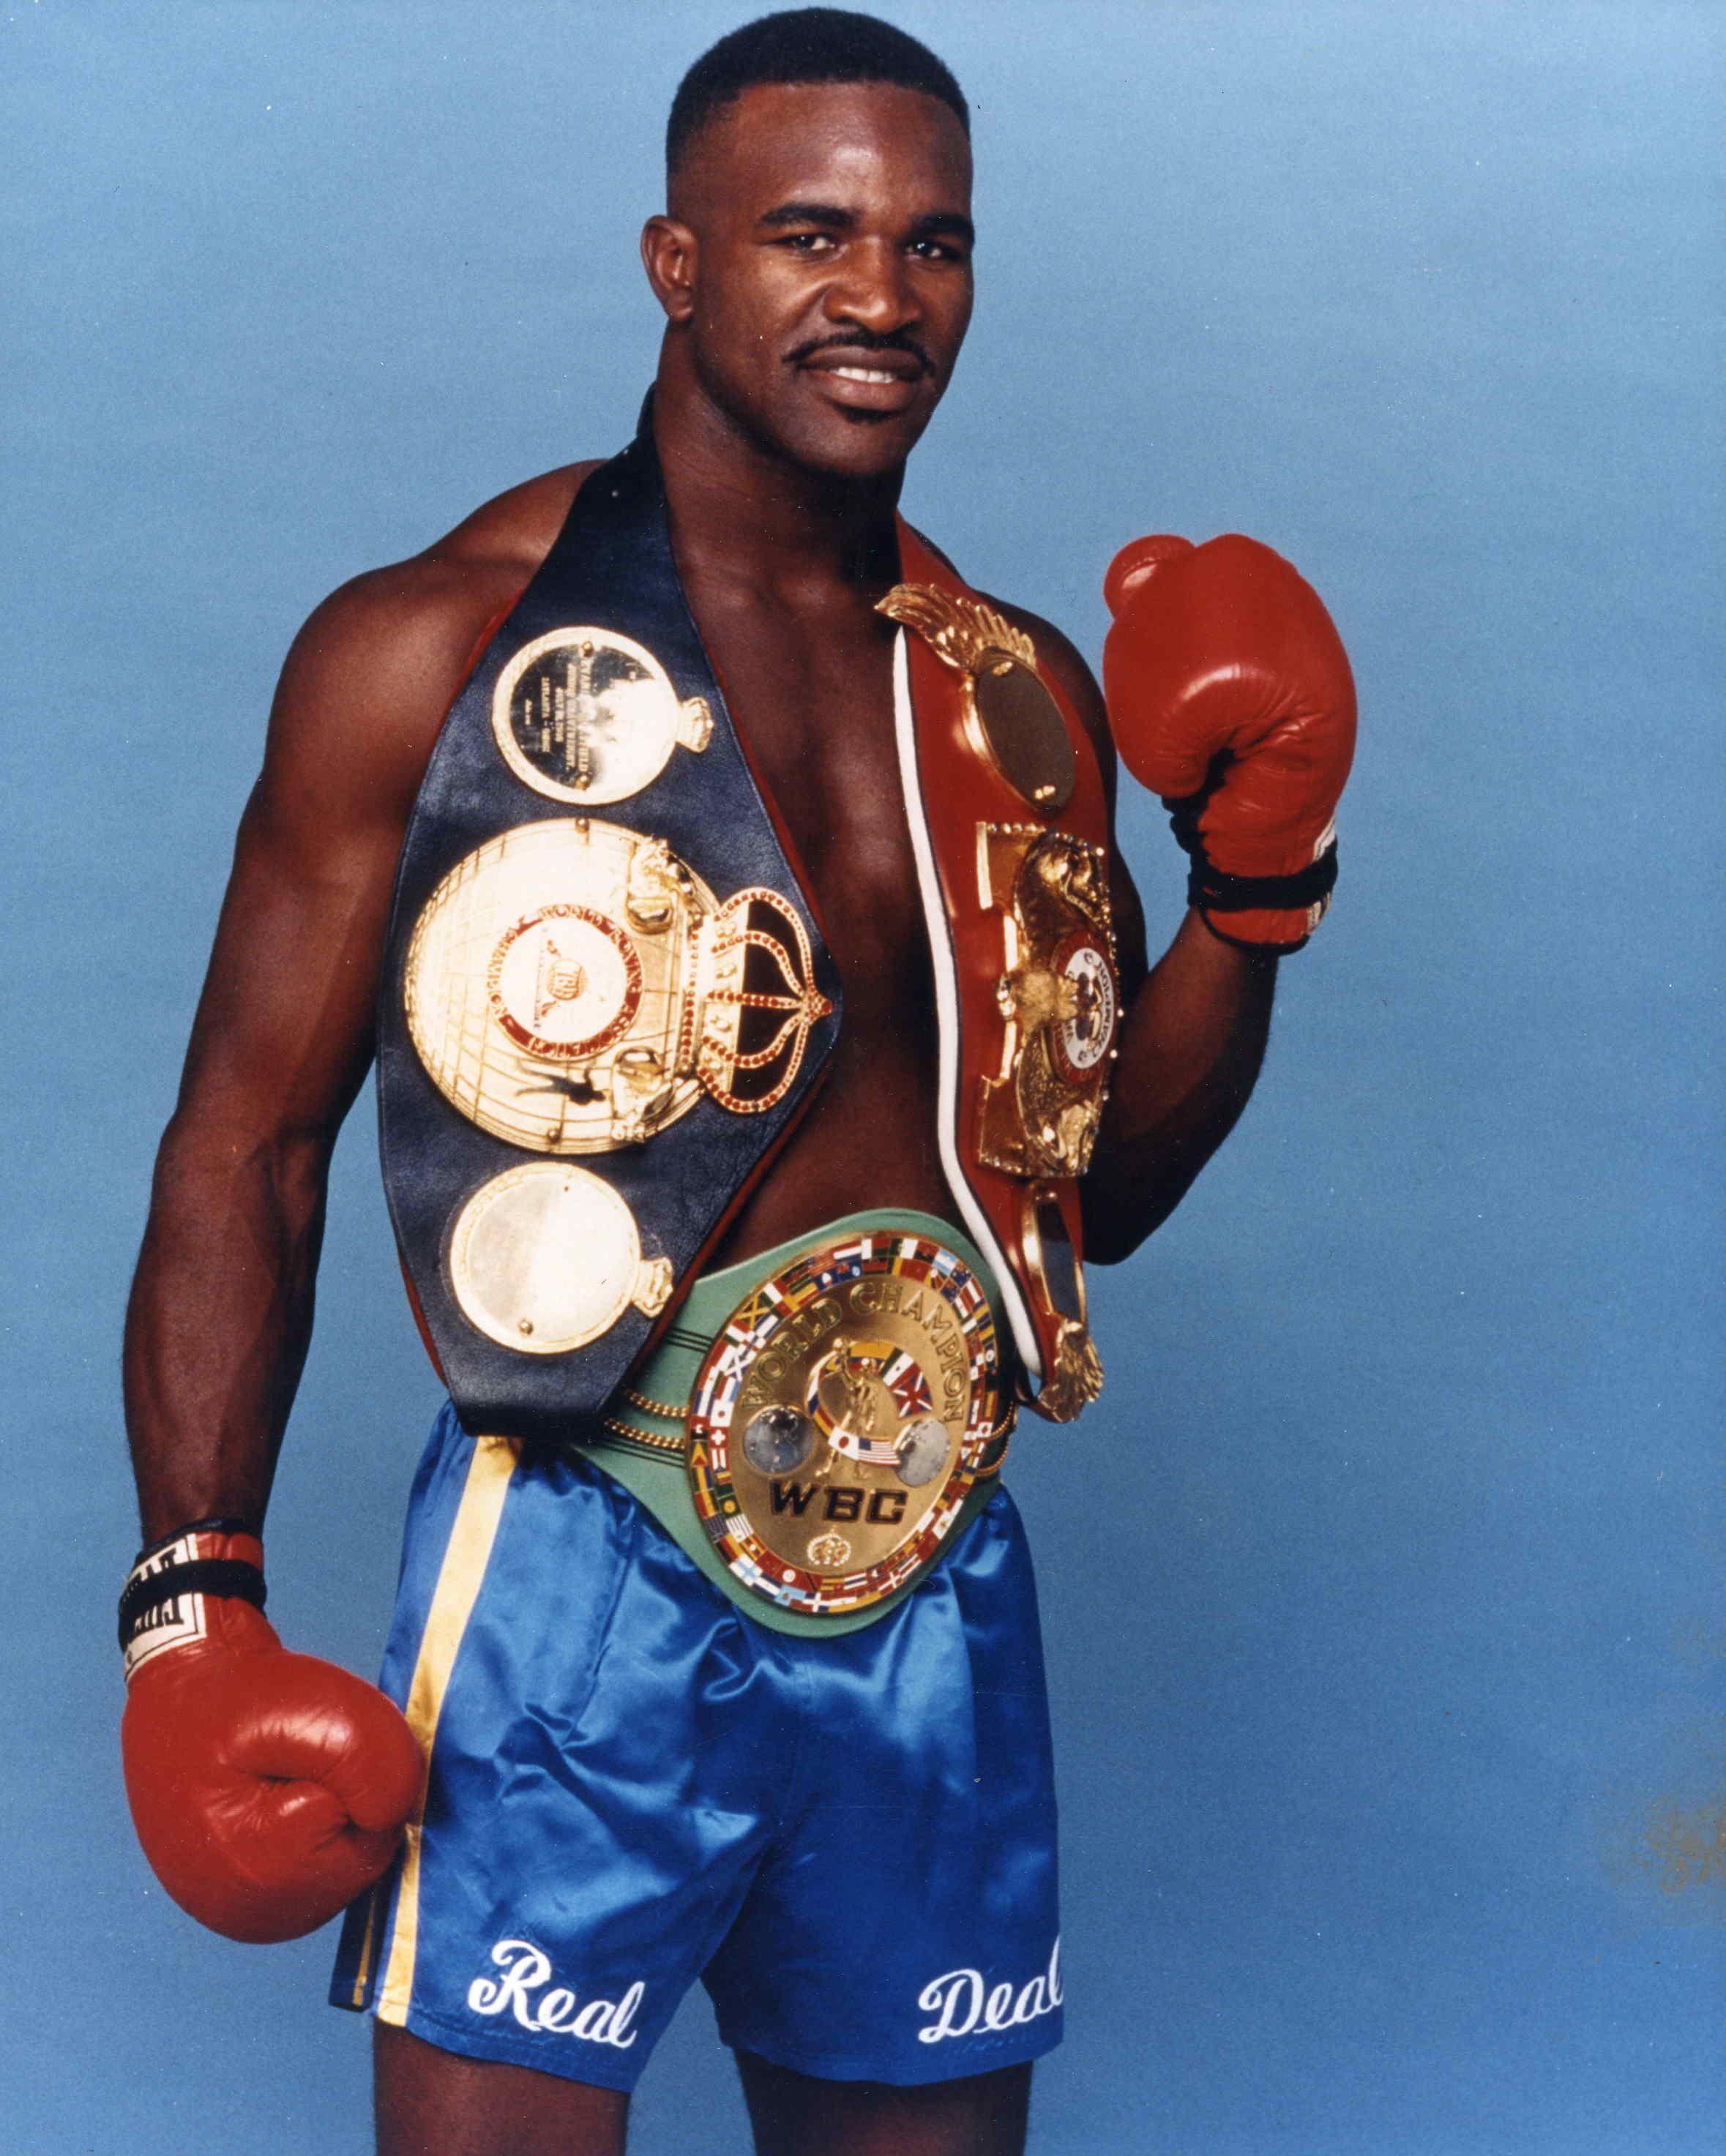 5x World Champion Evander Boxing History Boxing Champions